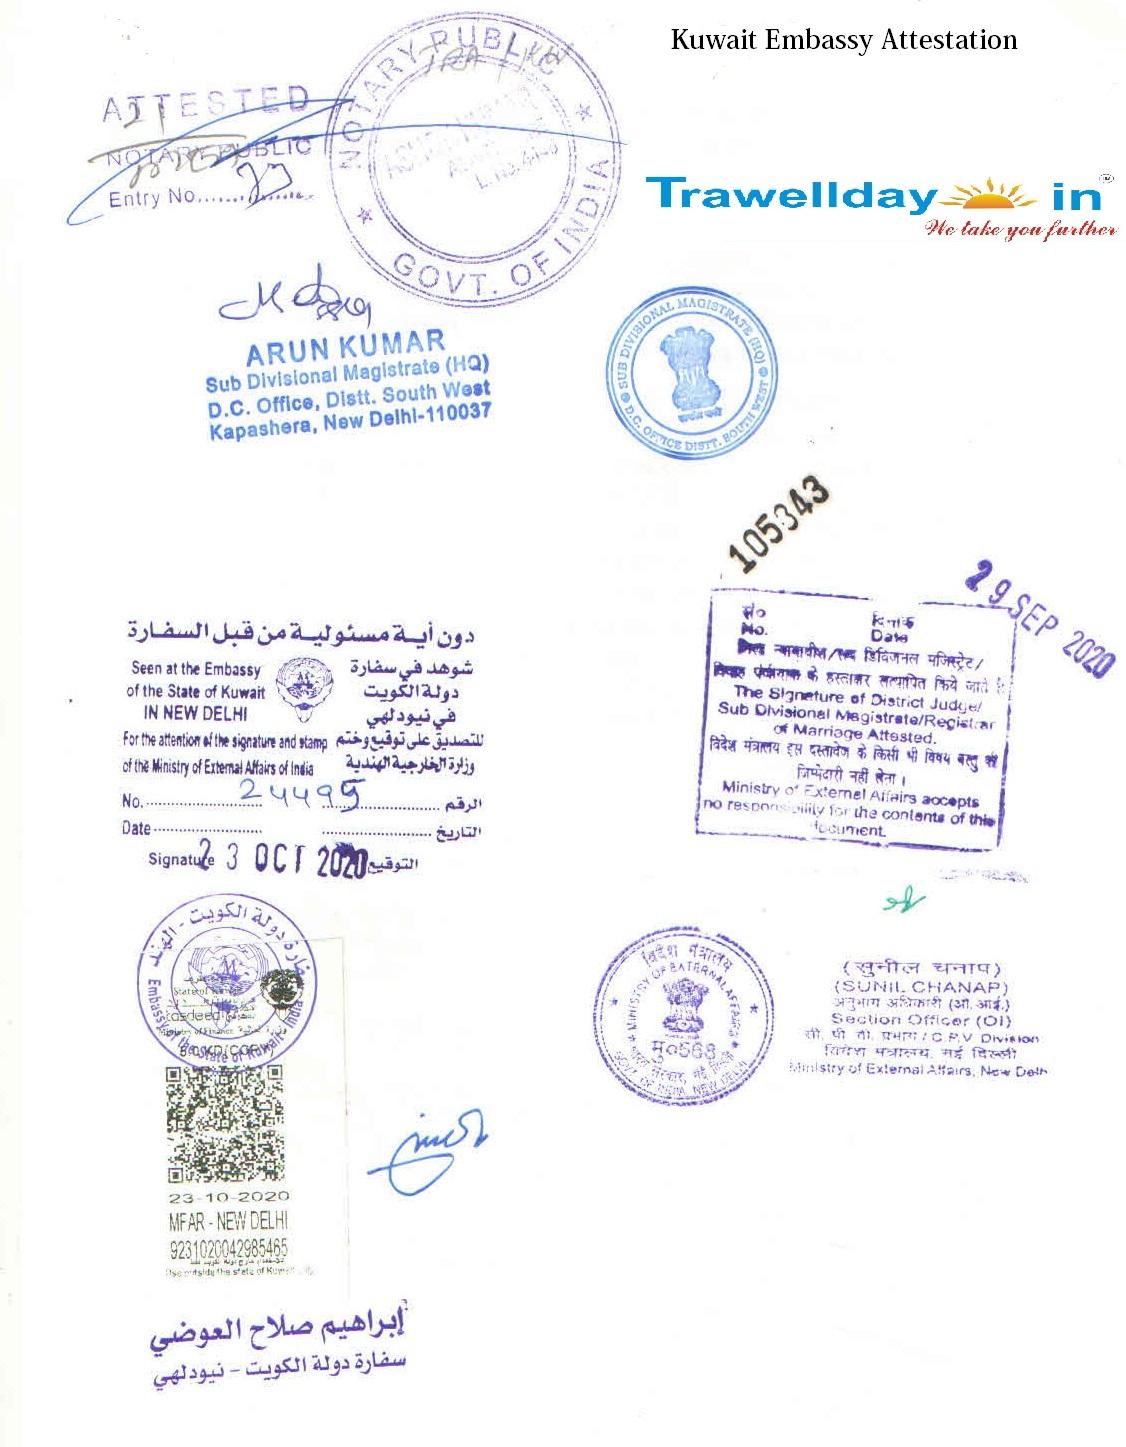 Kuwait-Embassy-Attestation-sample